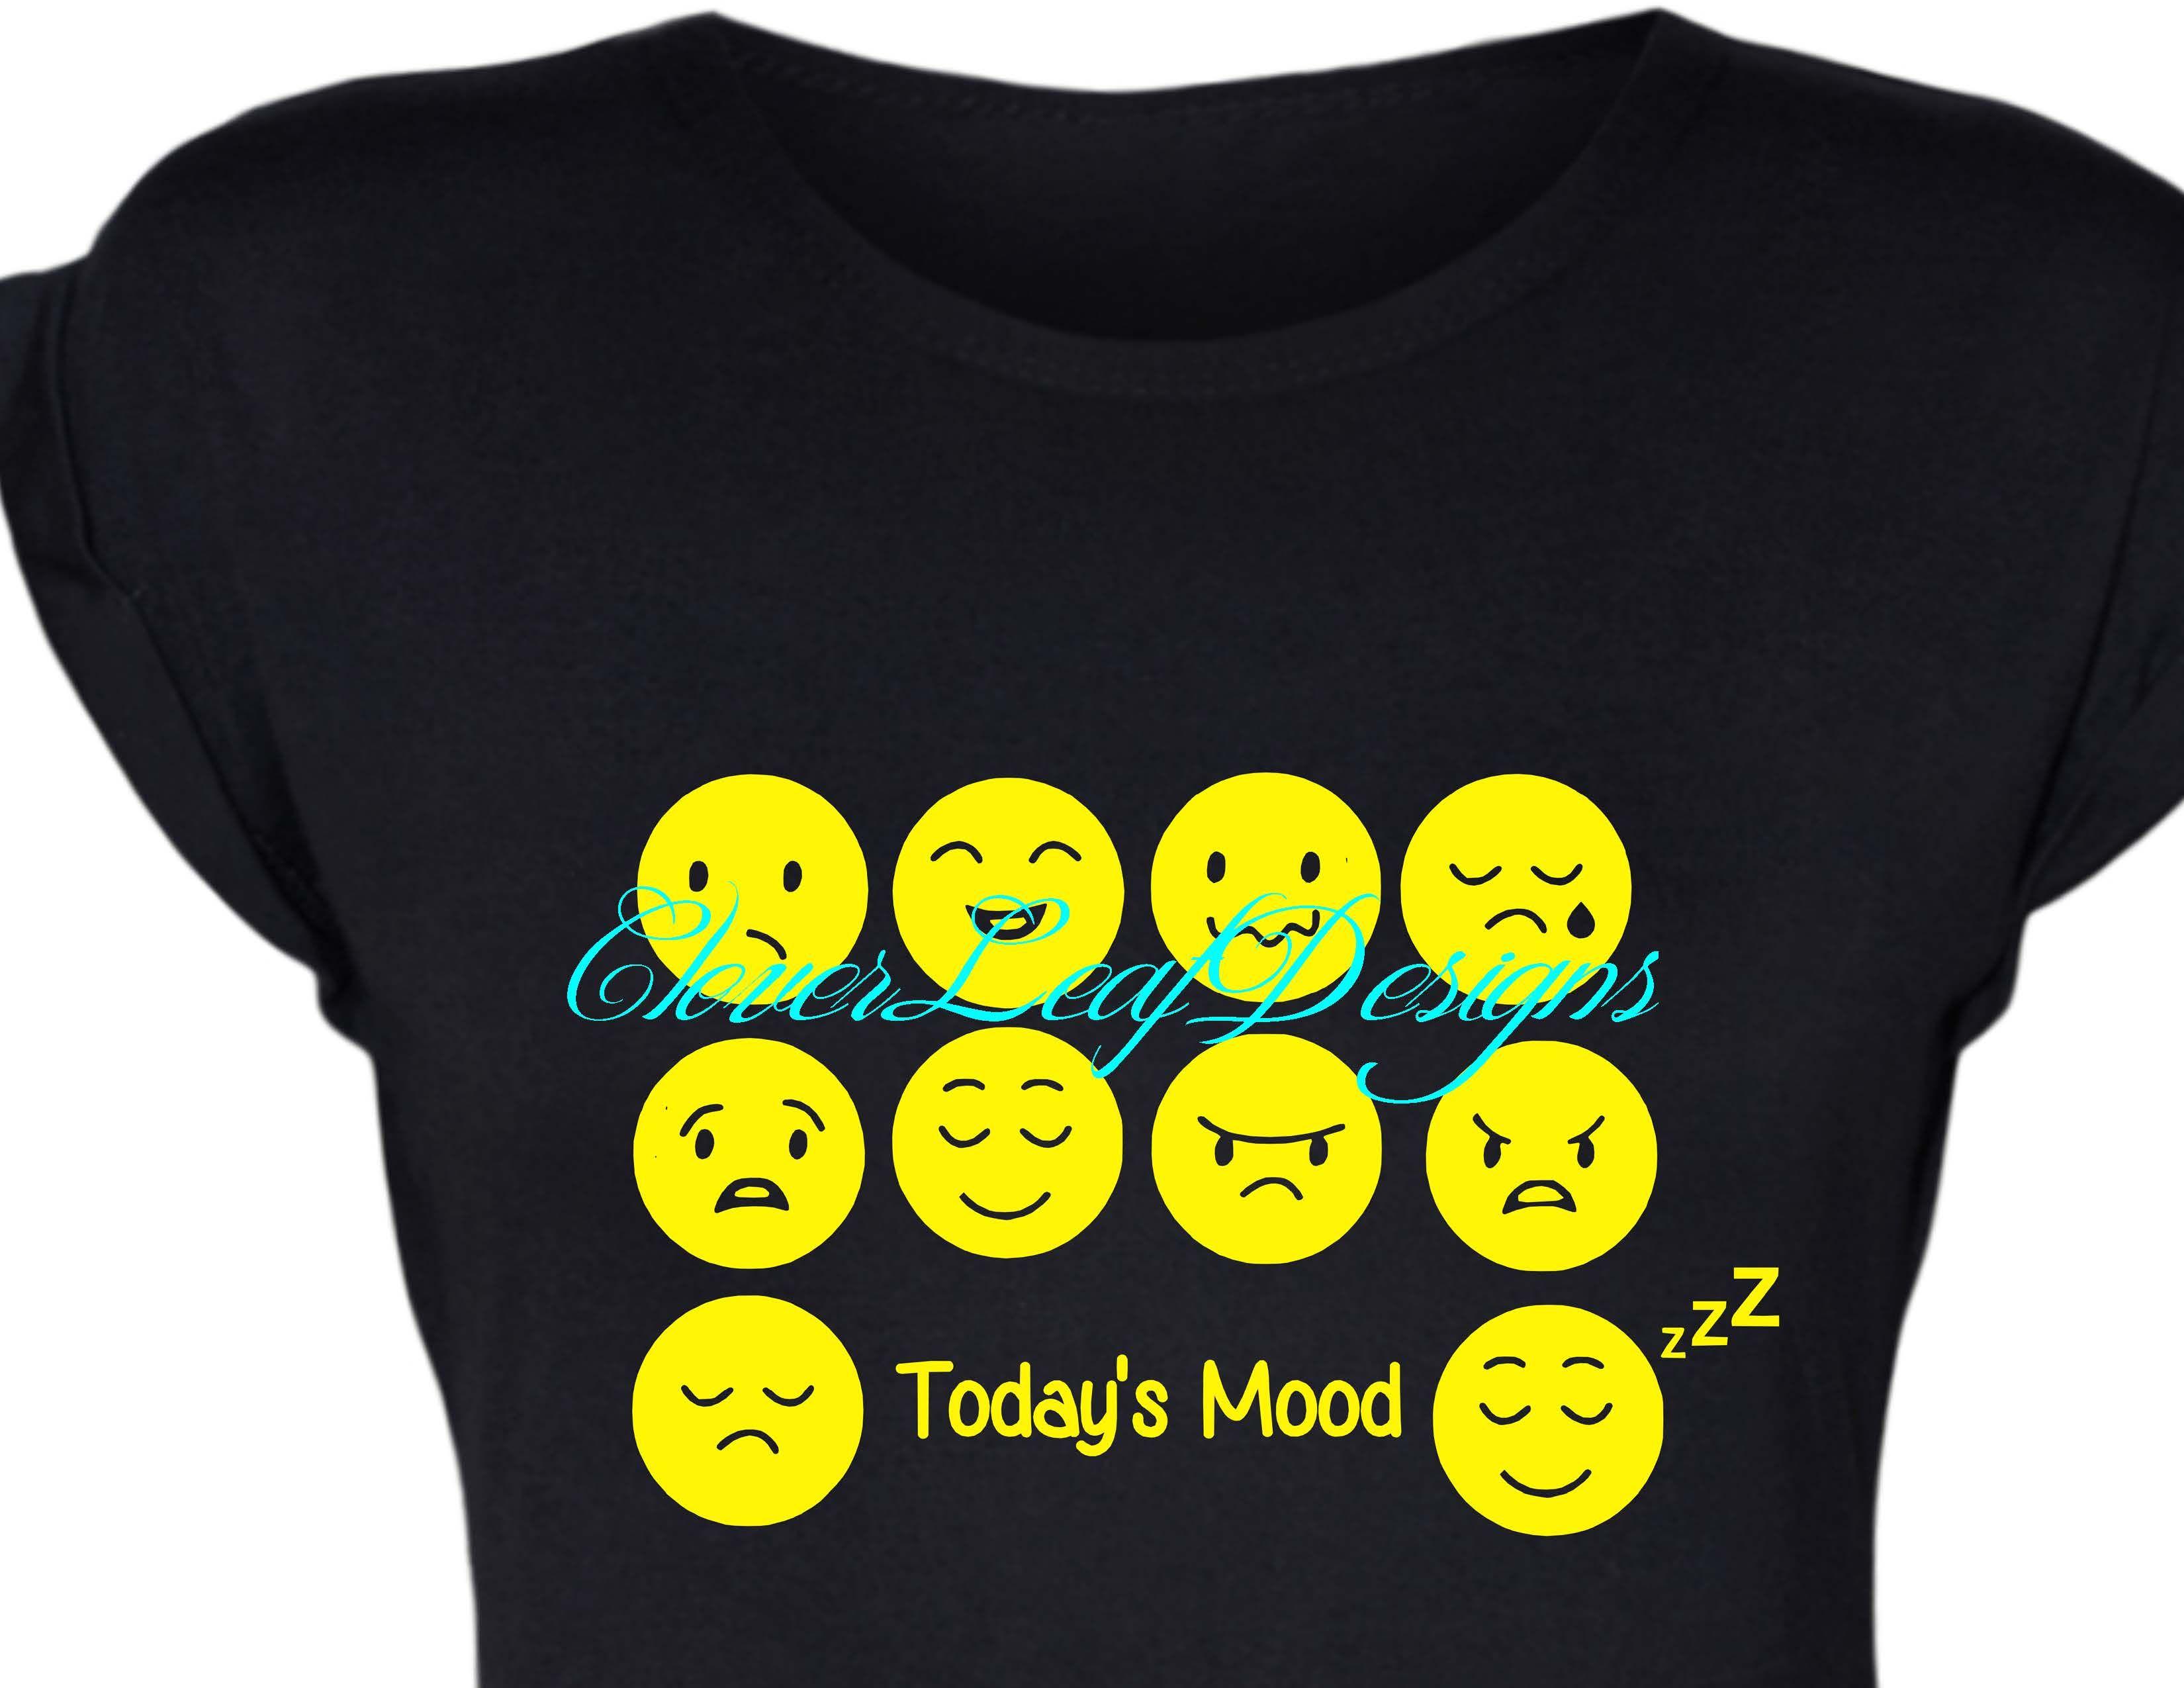 Today's Emoji Mood shirt.